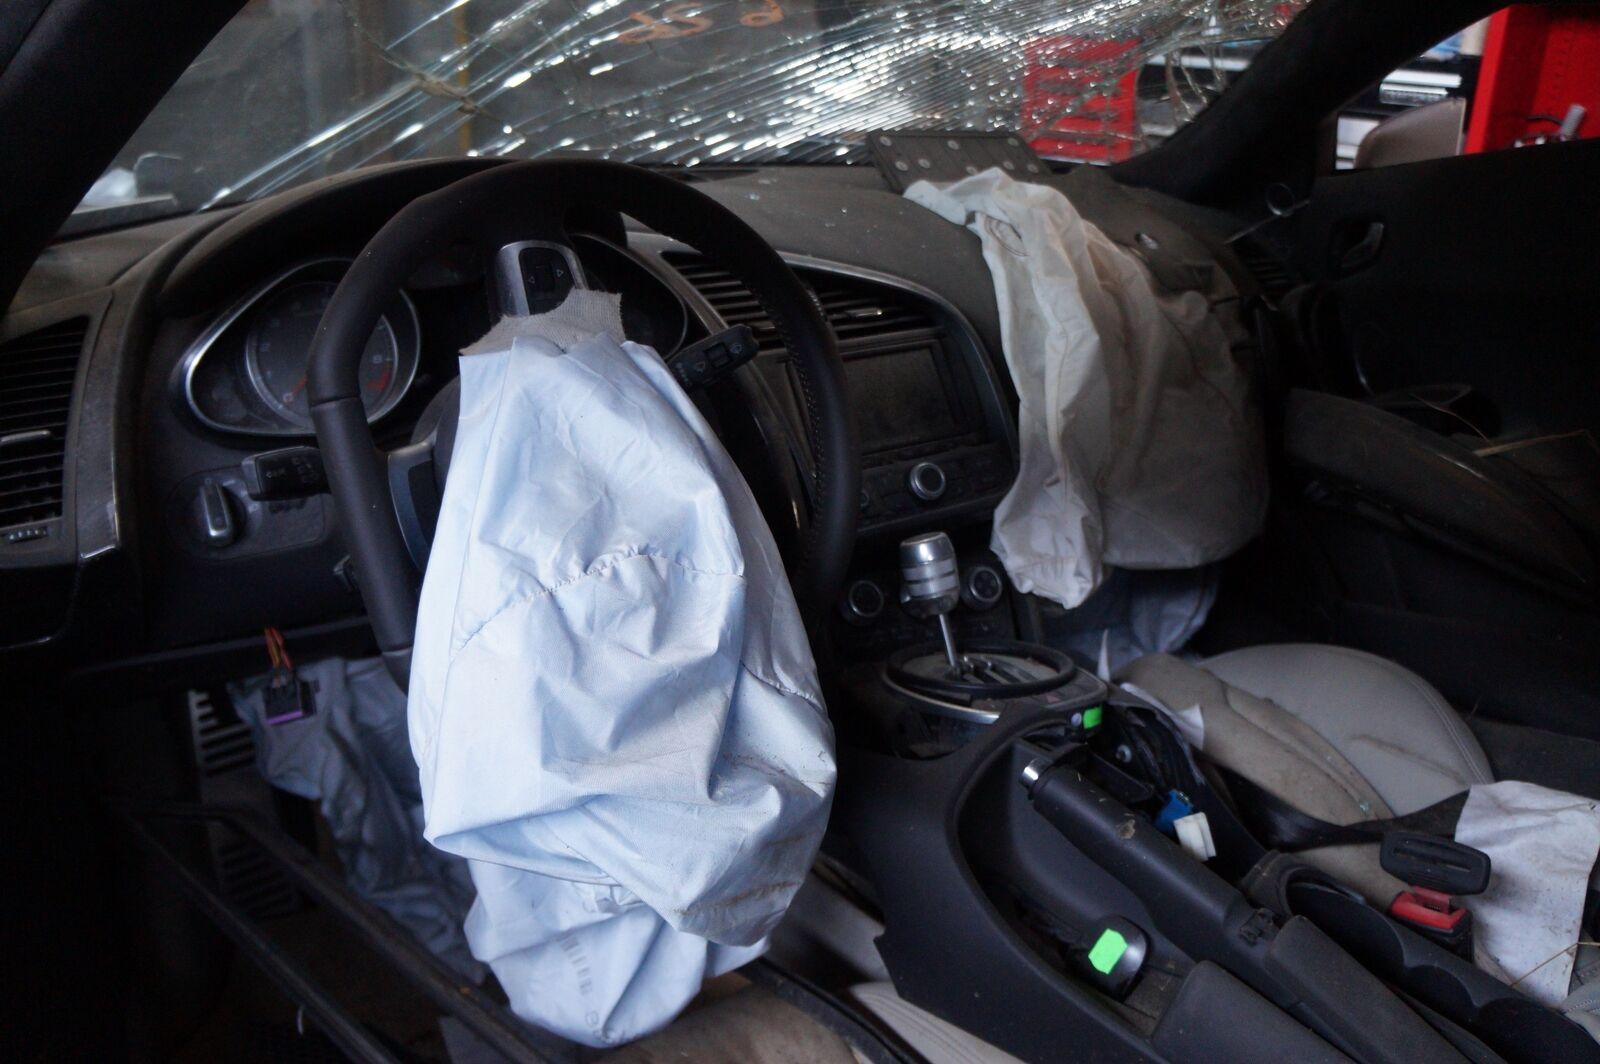 Battery Fuse Box Block Cut Off Switch 420937548a 4f0915519 Audi R8 Car